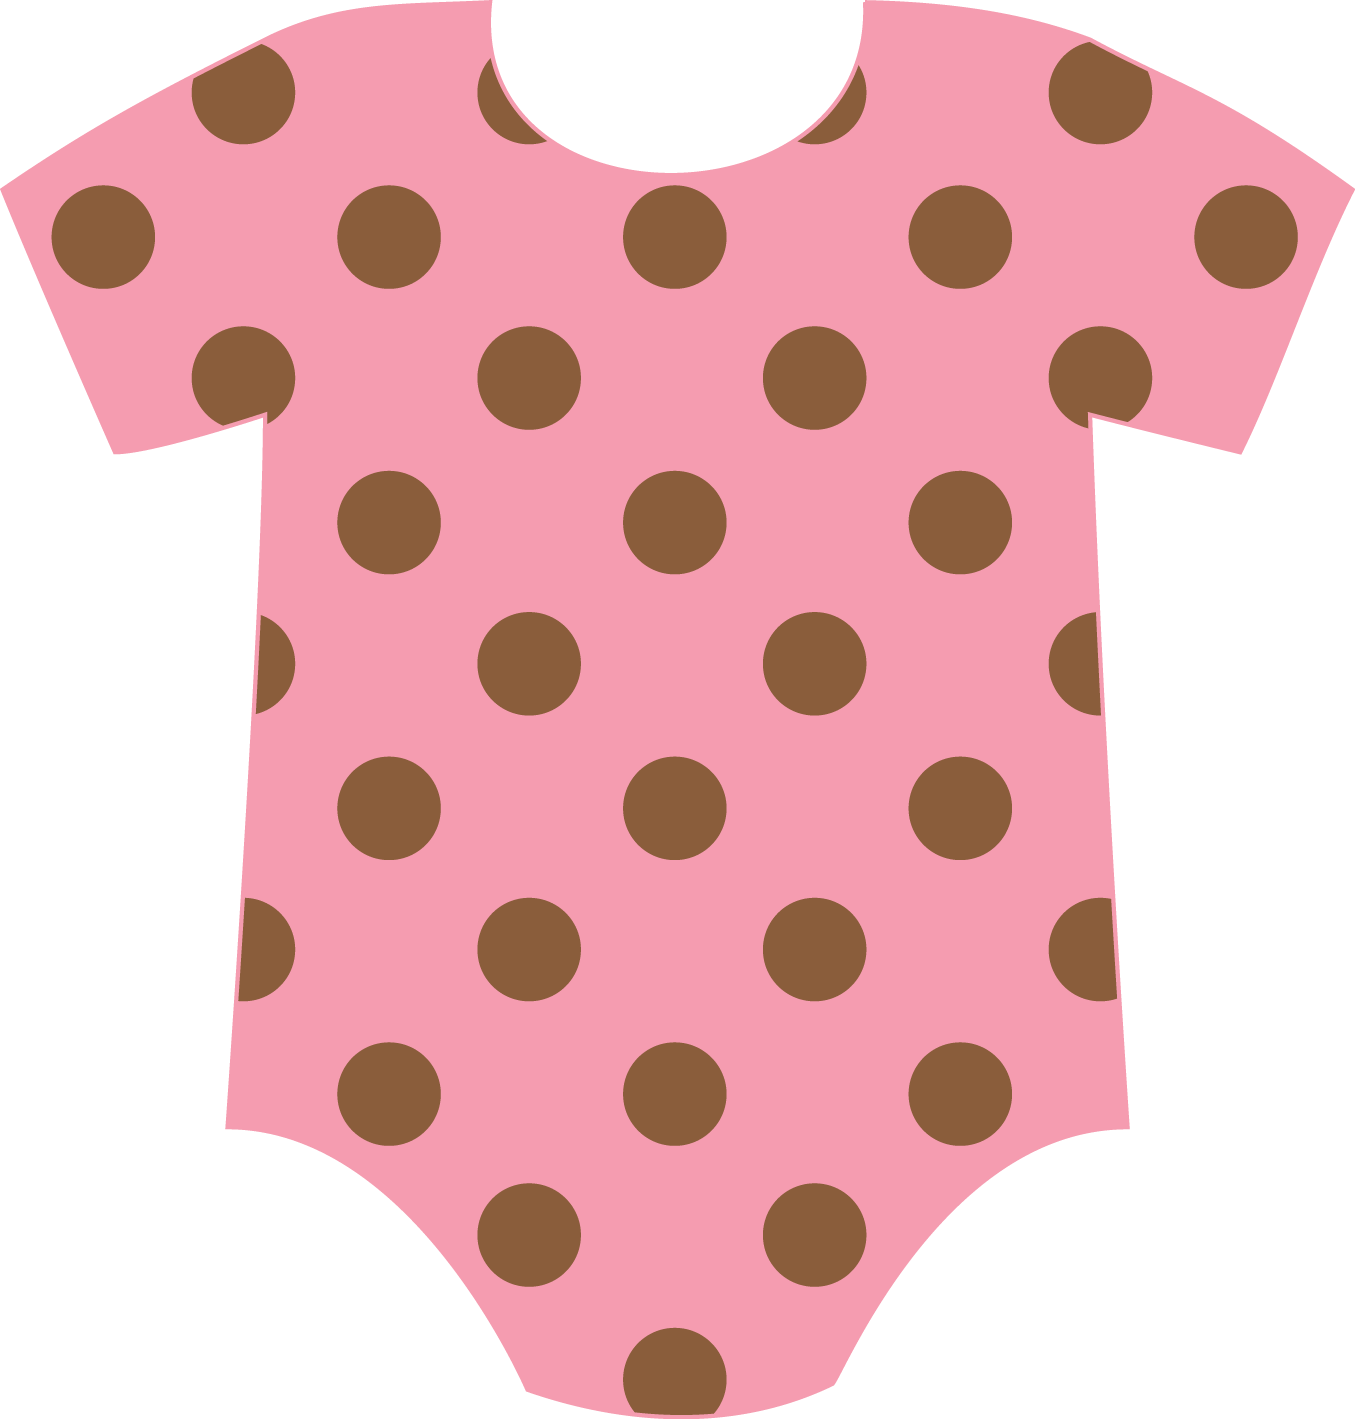 Clipart de Bodies de Bebé. | Bebé | Pinterest | Clipart, Bebé y Baby ...